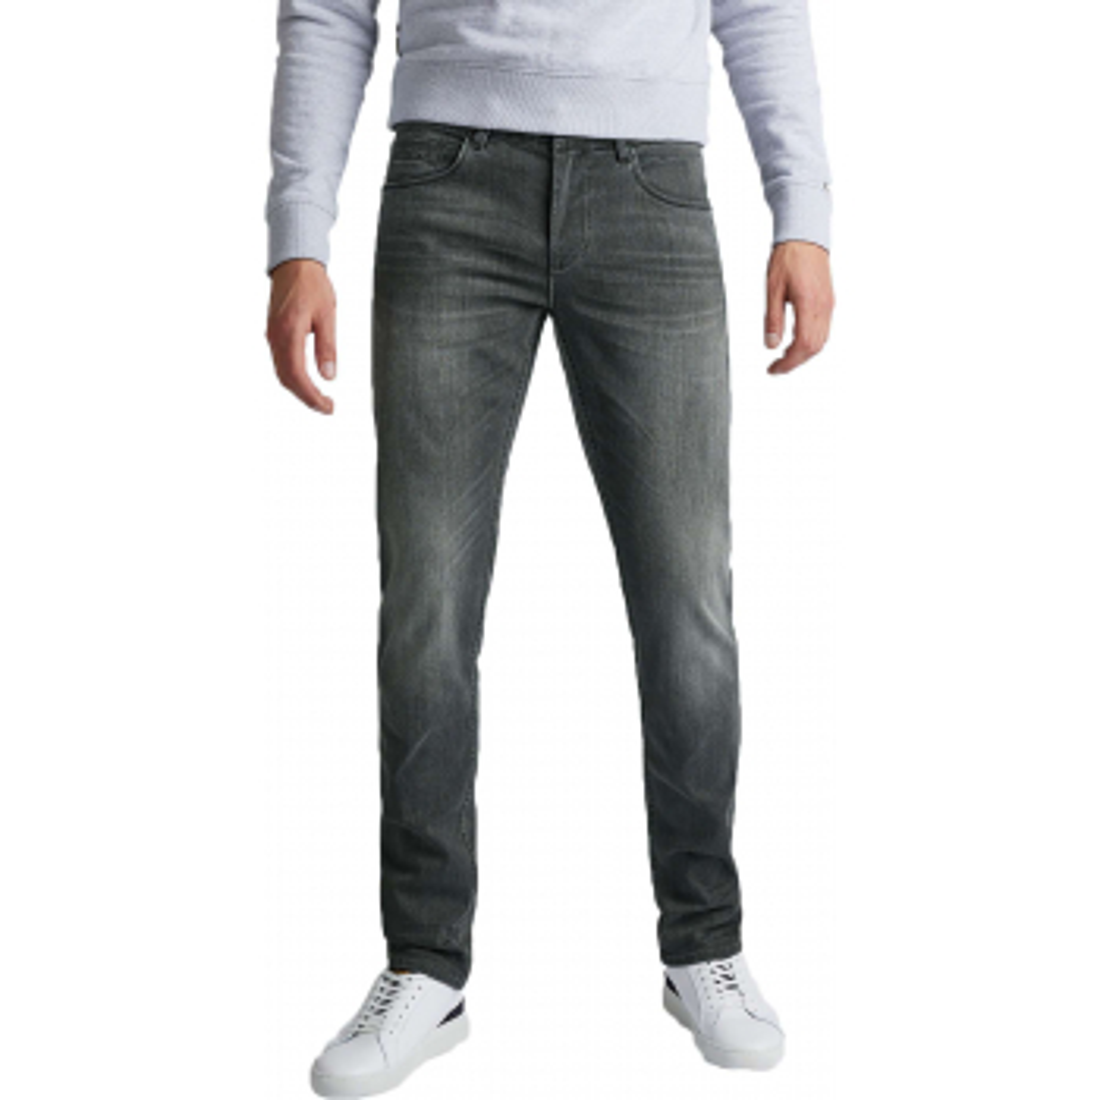 Pme legend nightflight jeans stone smg